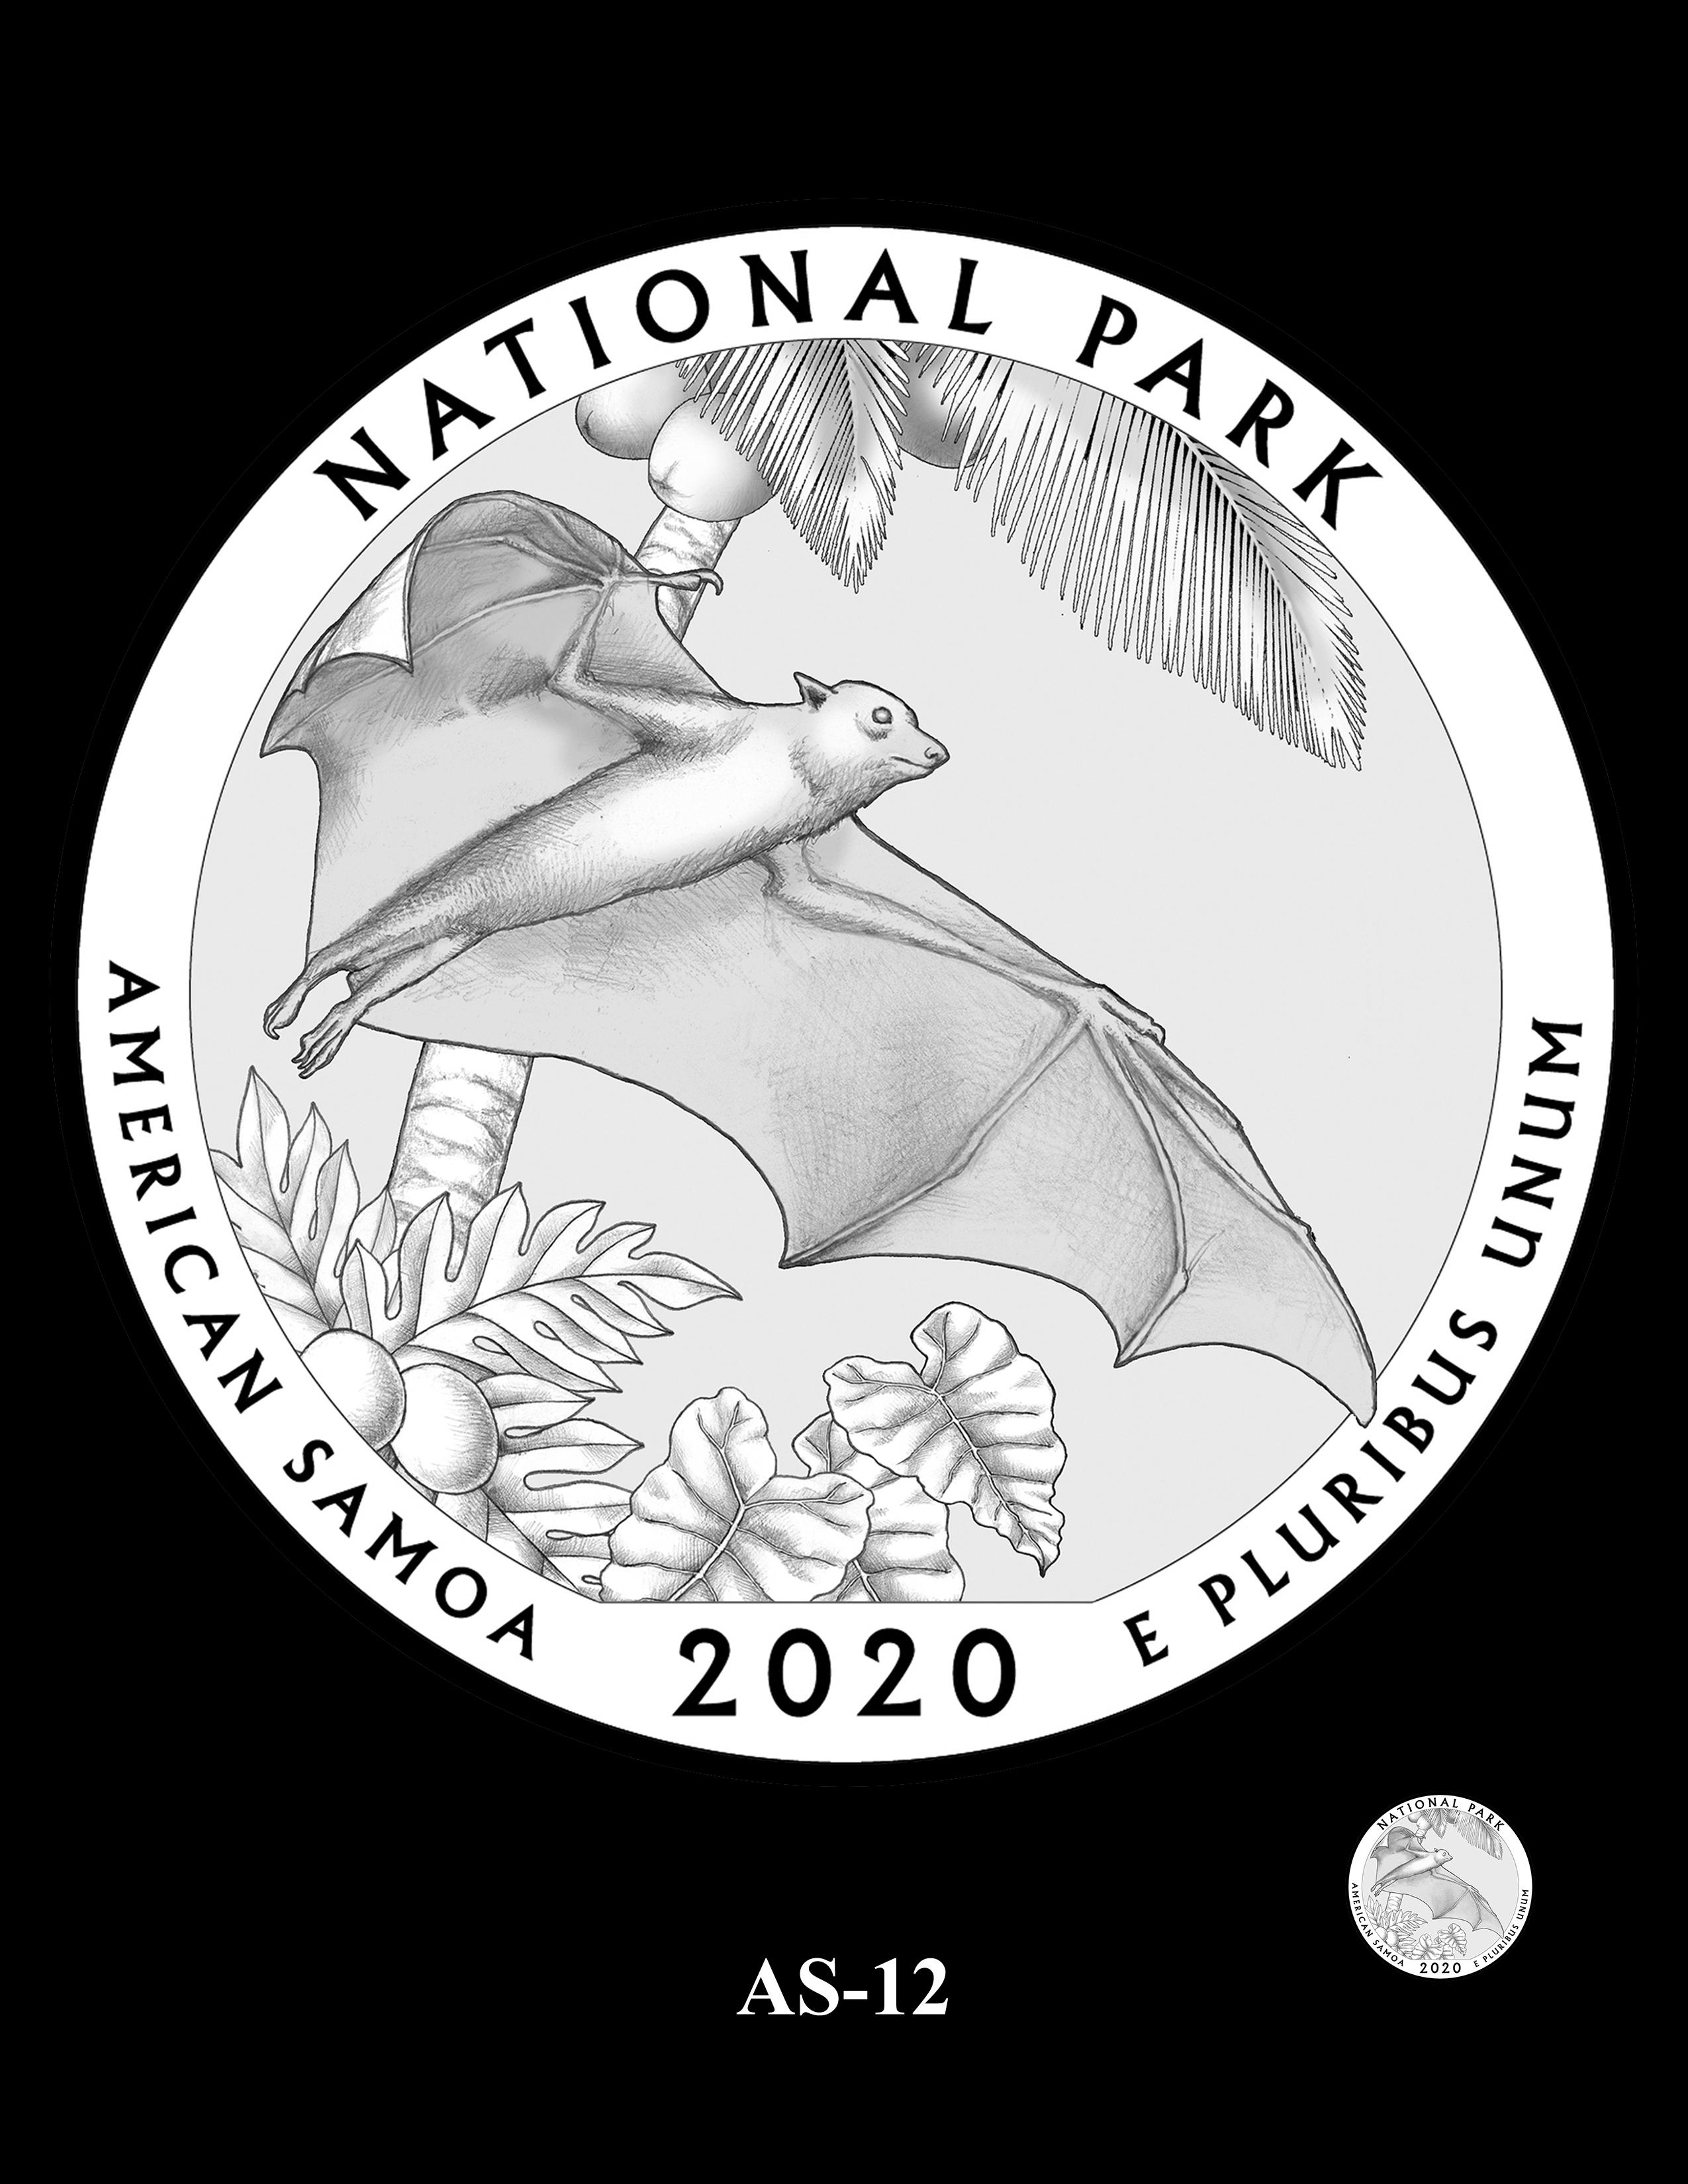 AS-12 -- 2020 America the Beautiful Quarters® Program